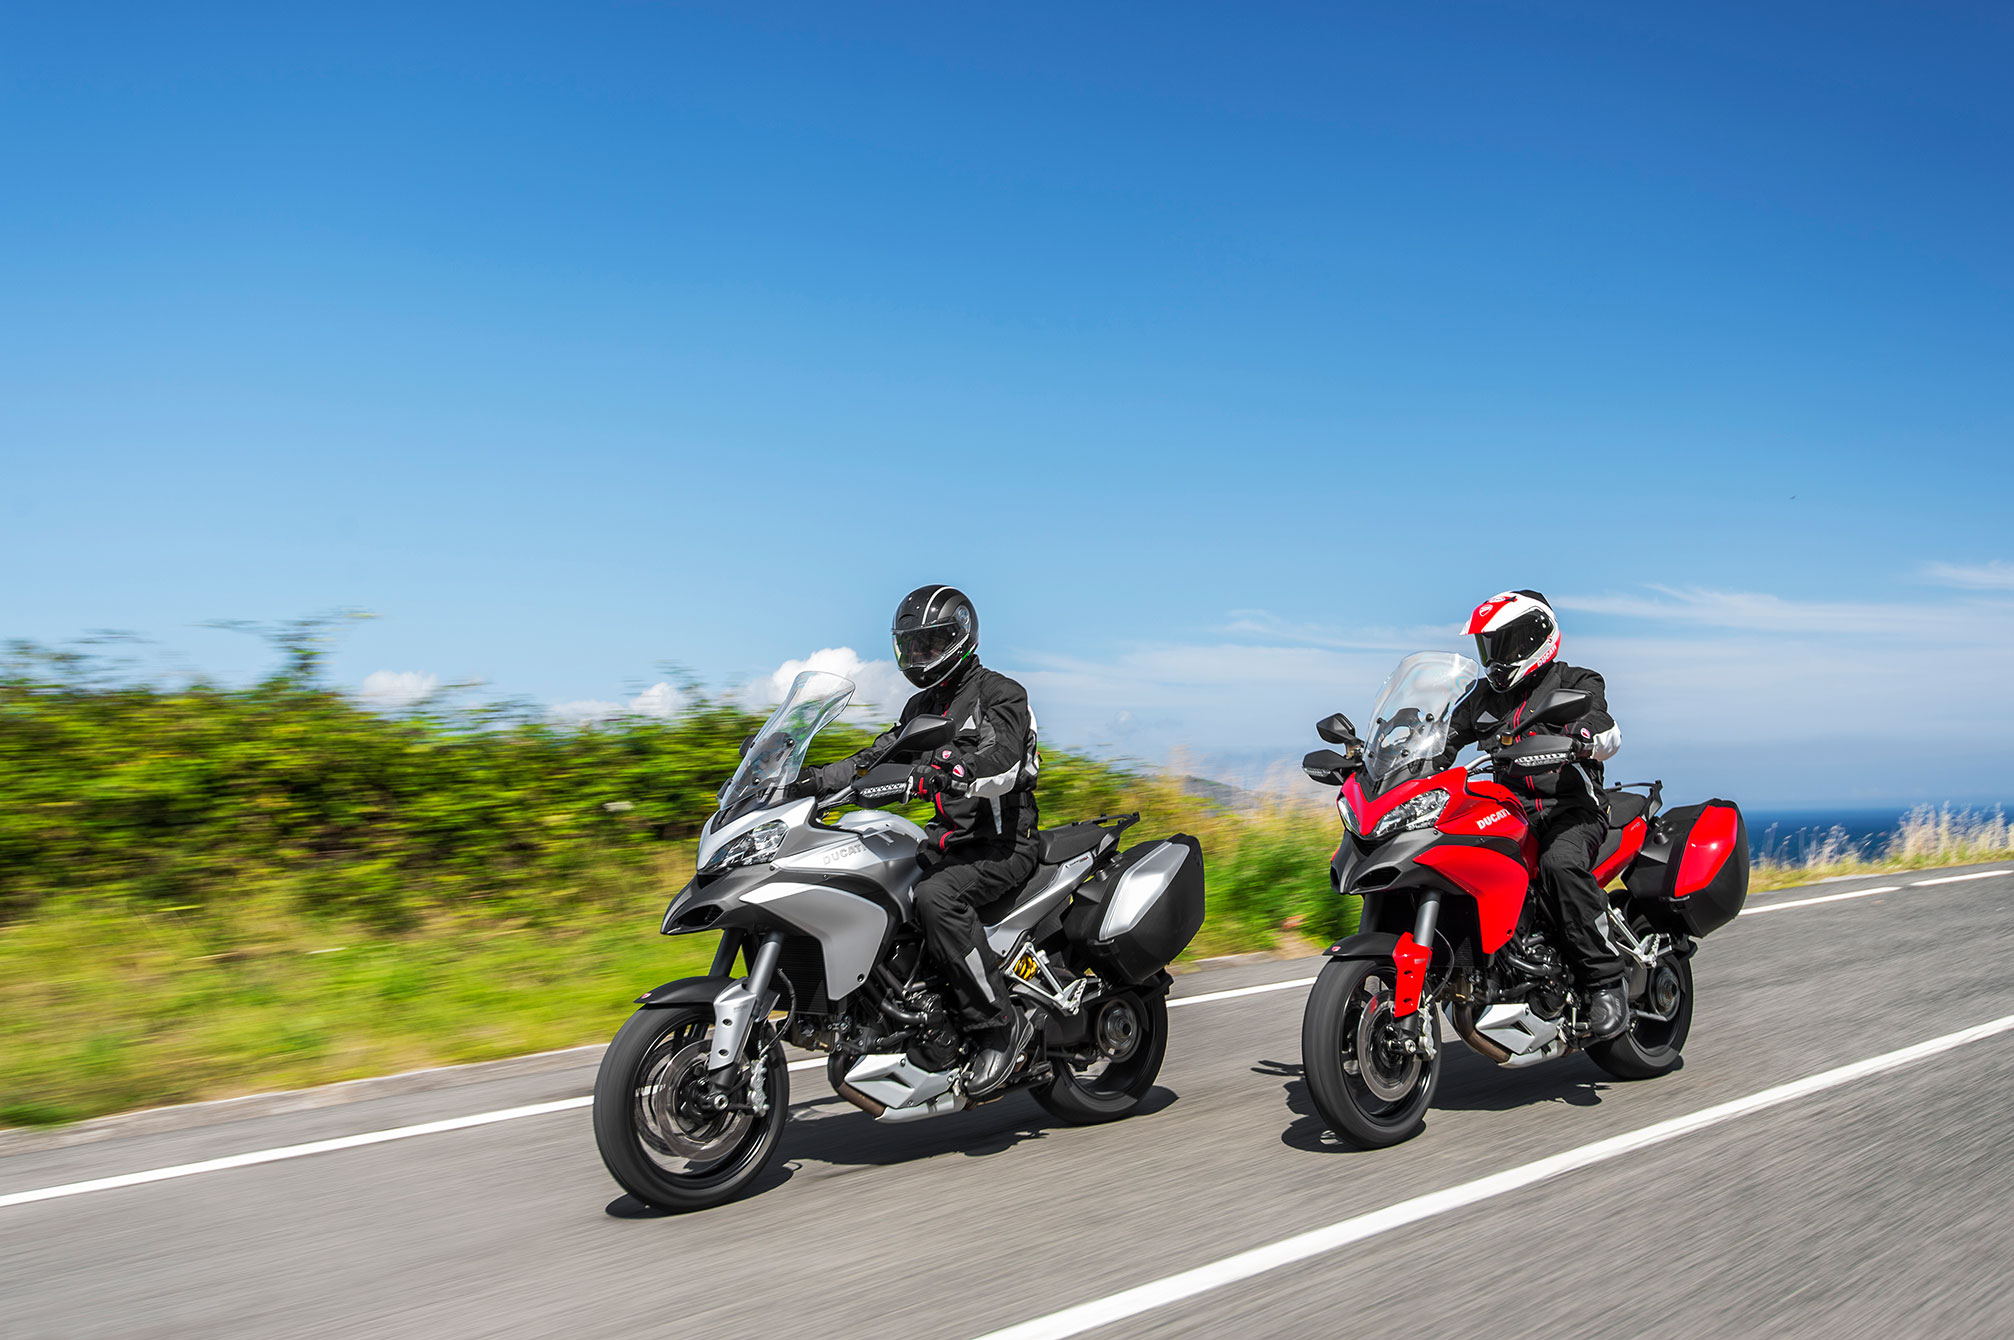 Ducati Skyhook